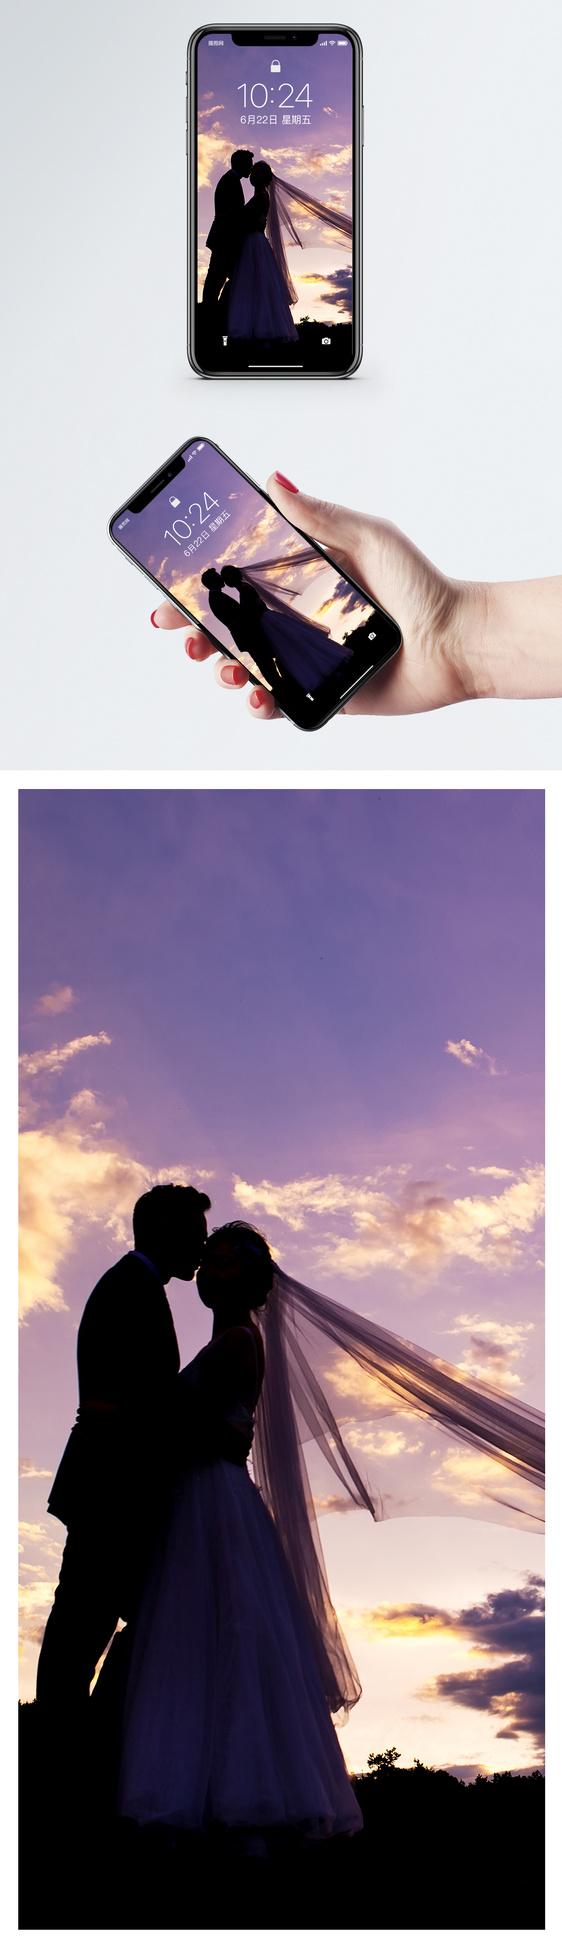 Wedding photo mobile wallpaper